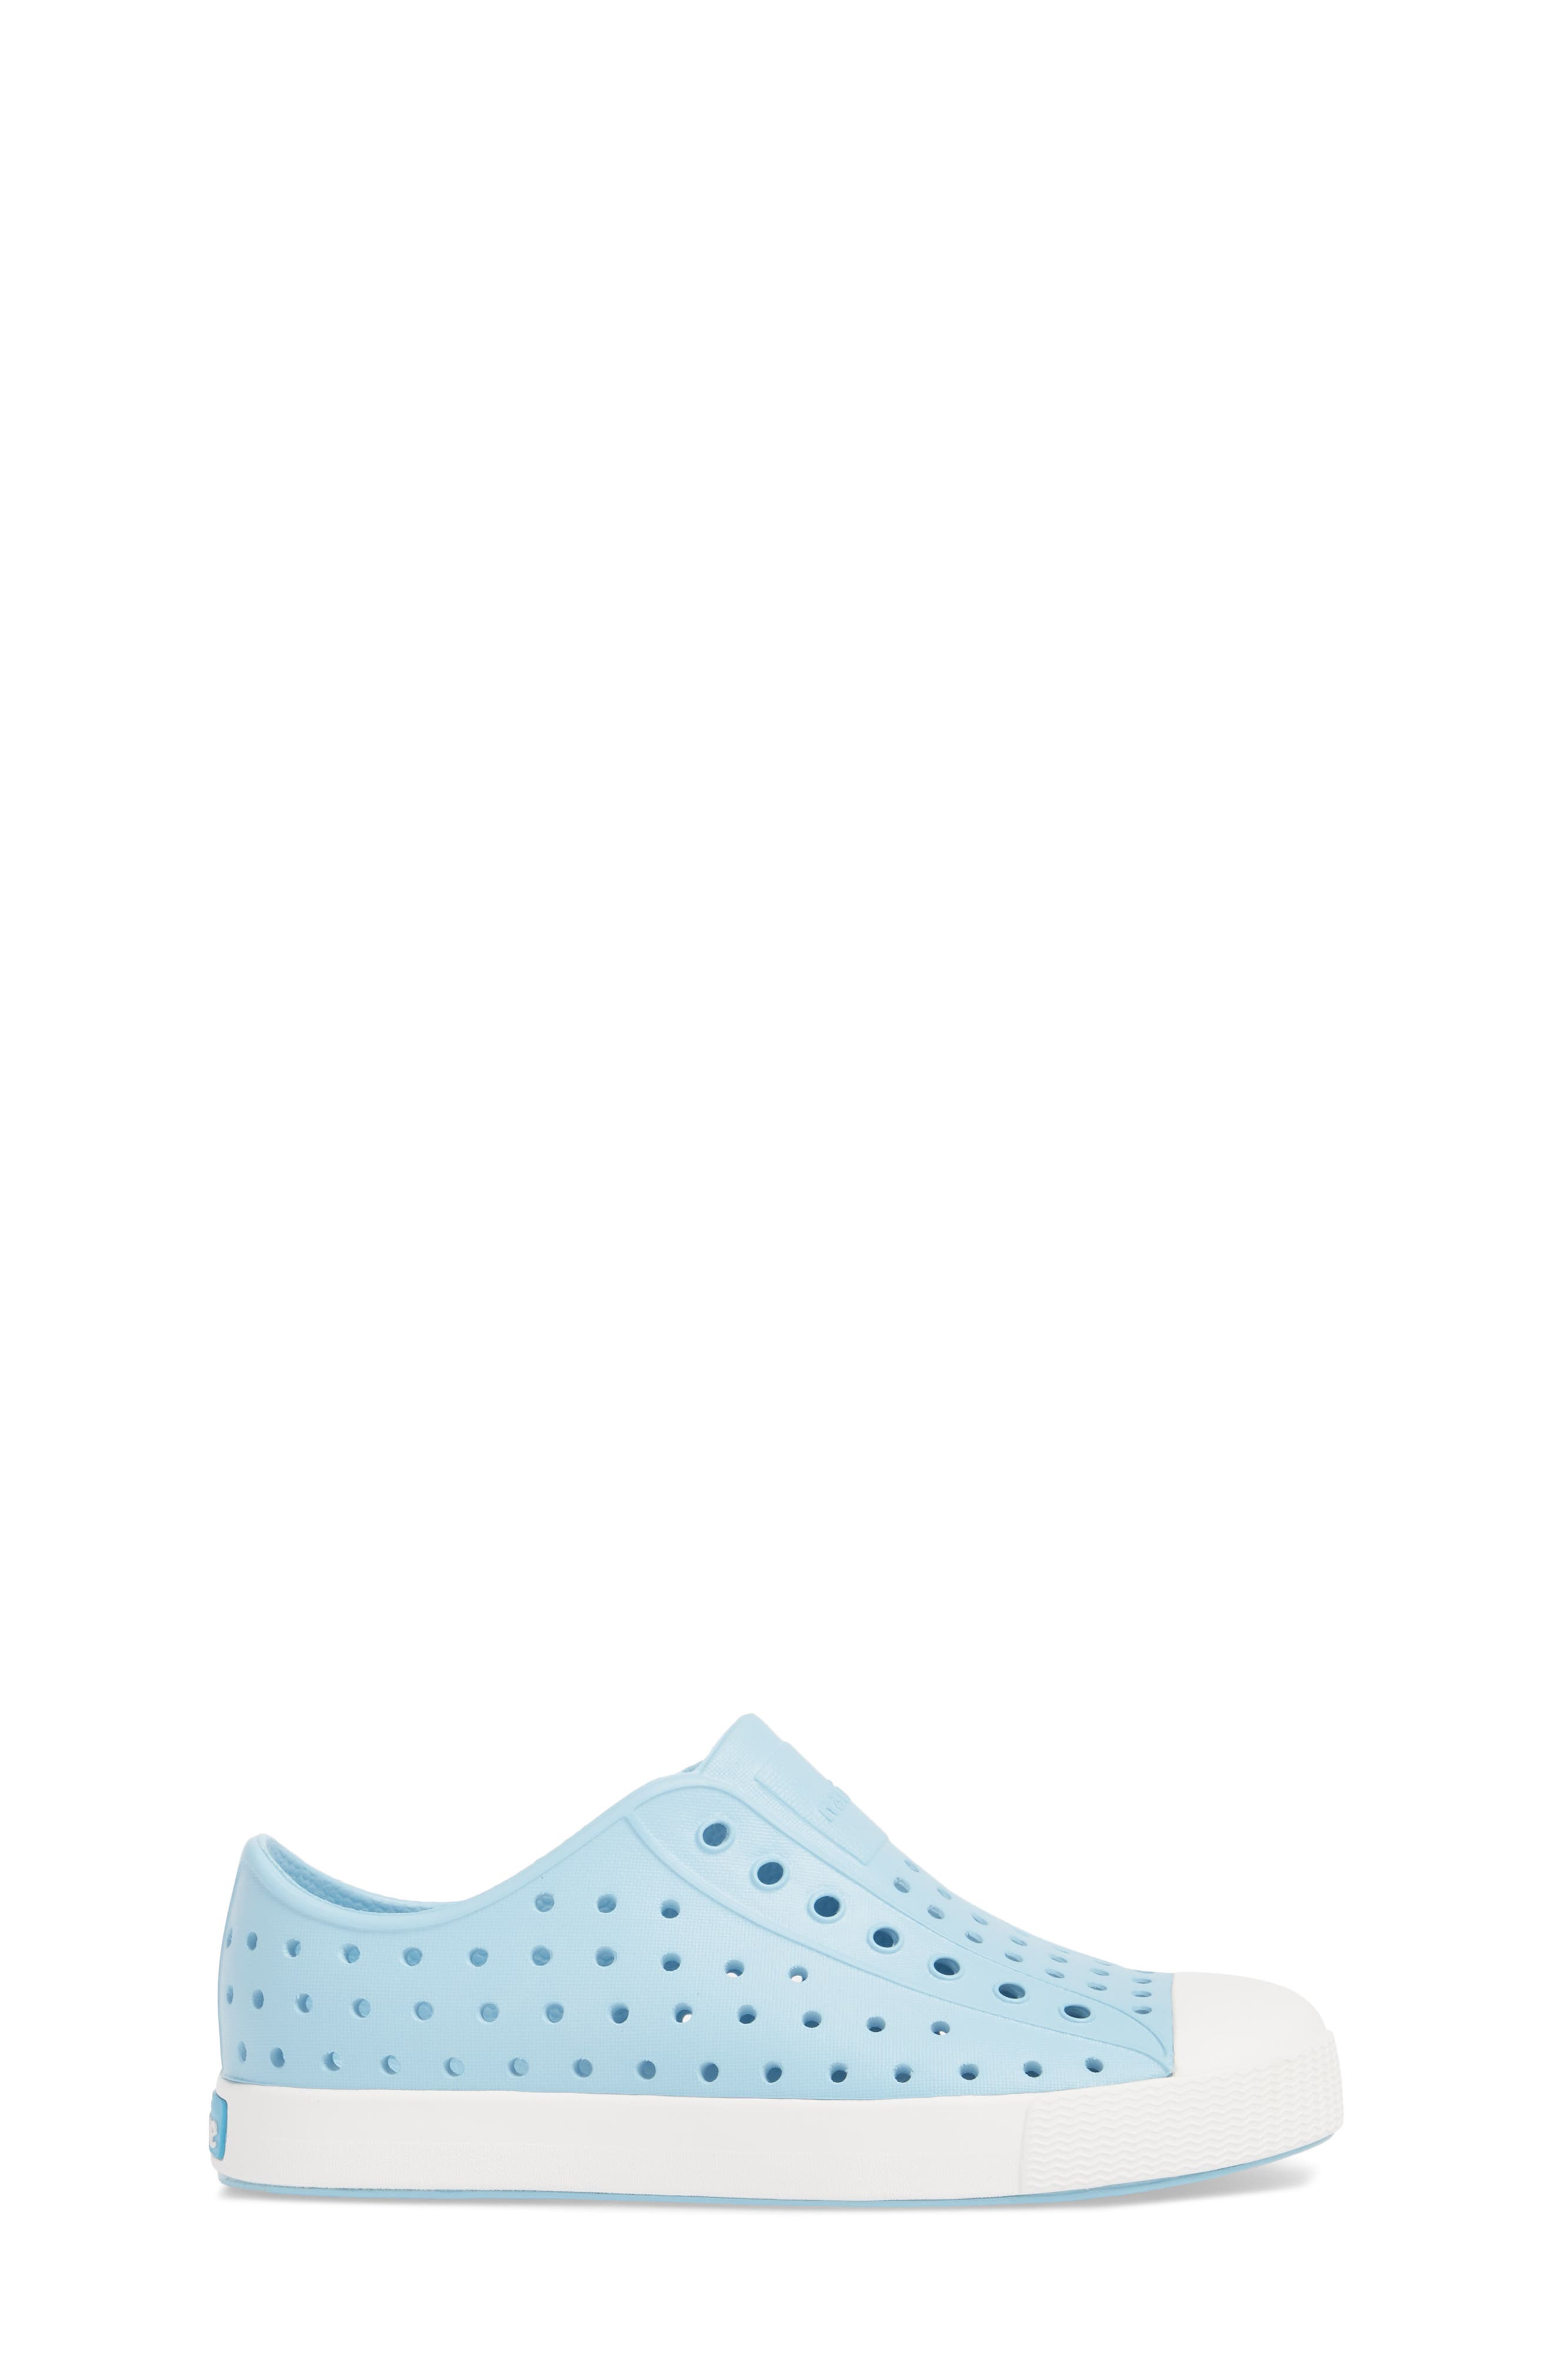 'Jefferson' Water Friendly Slip-On Sneaker,                             Alternate thumbnail 128, color,